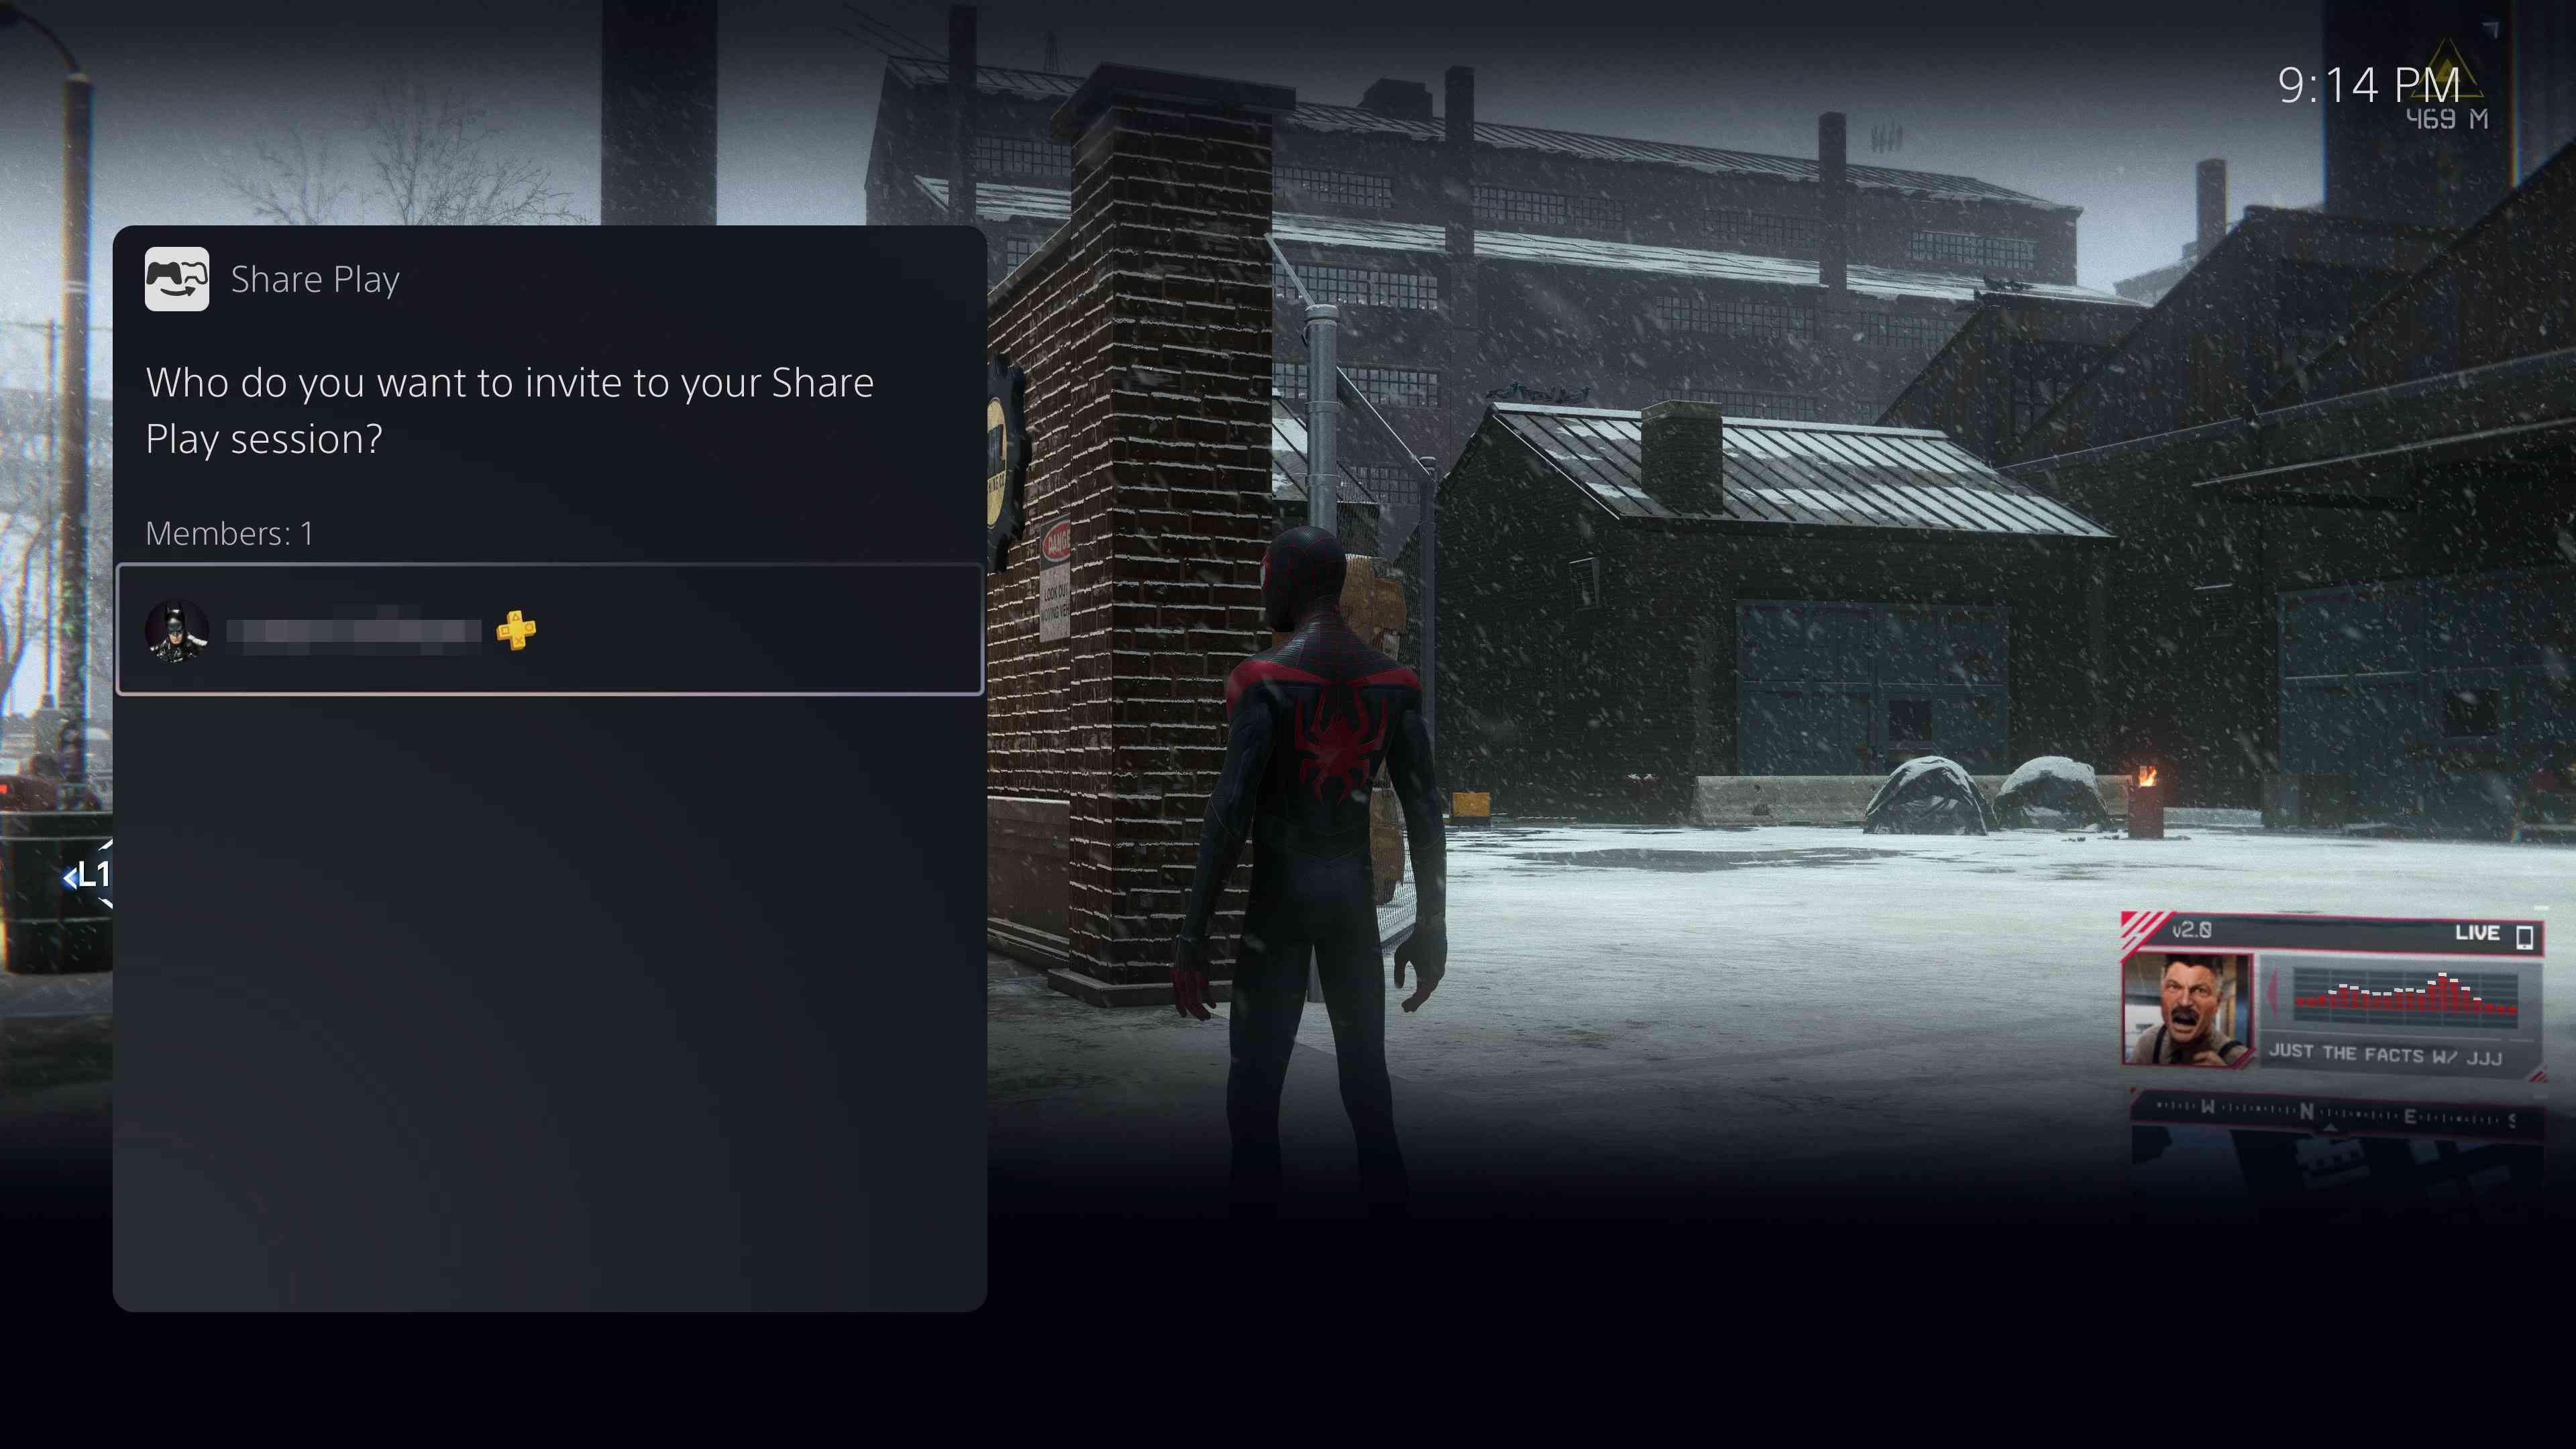 The Share Play invitation screen